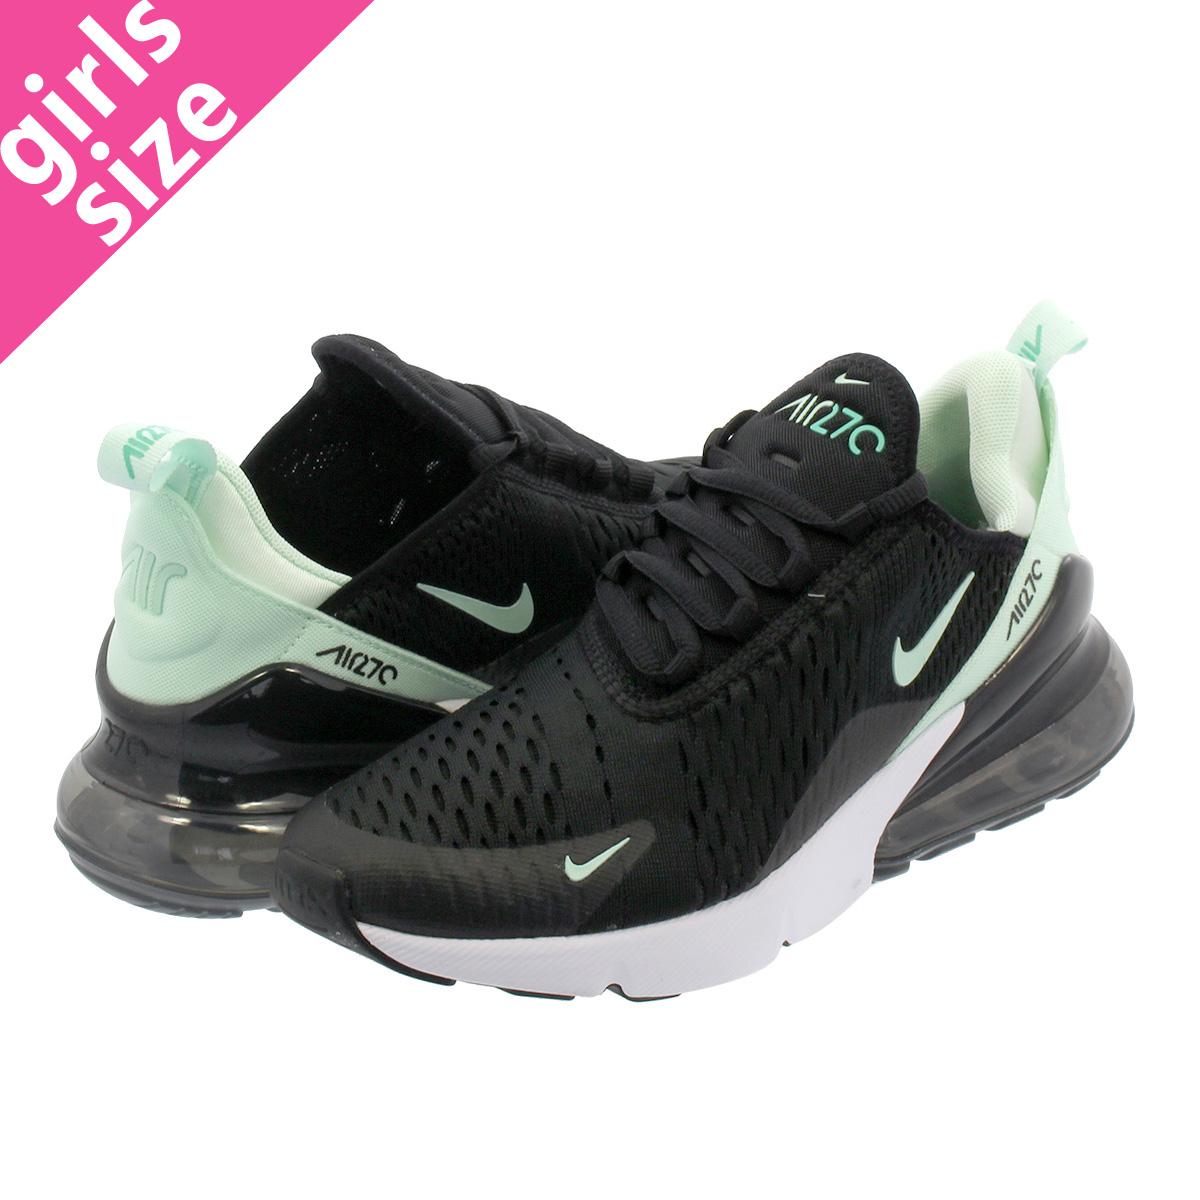 size 40 b7b35 944db NIKE WMNS AIR MAX 270 Nike women Air Max 270 BLACK/IGLOO/HYPER TURQ/WHITE  ah6789-008